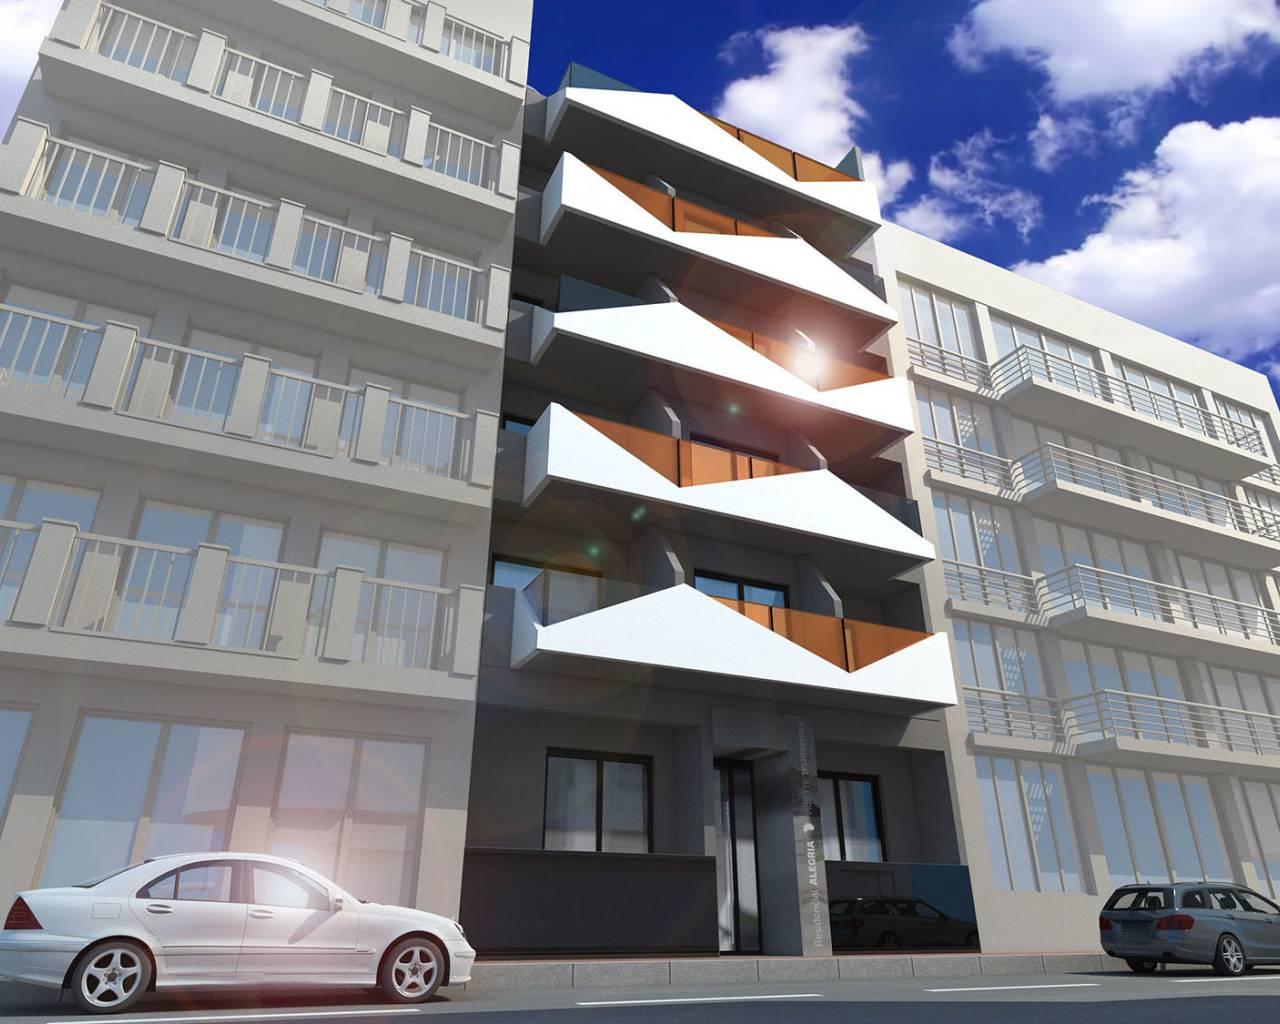 nieuwbouw-appartement-torrevieja-centrum-torrevieja_2795_xl